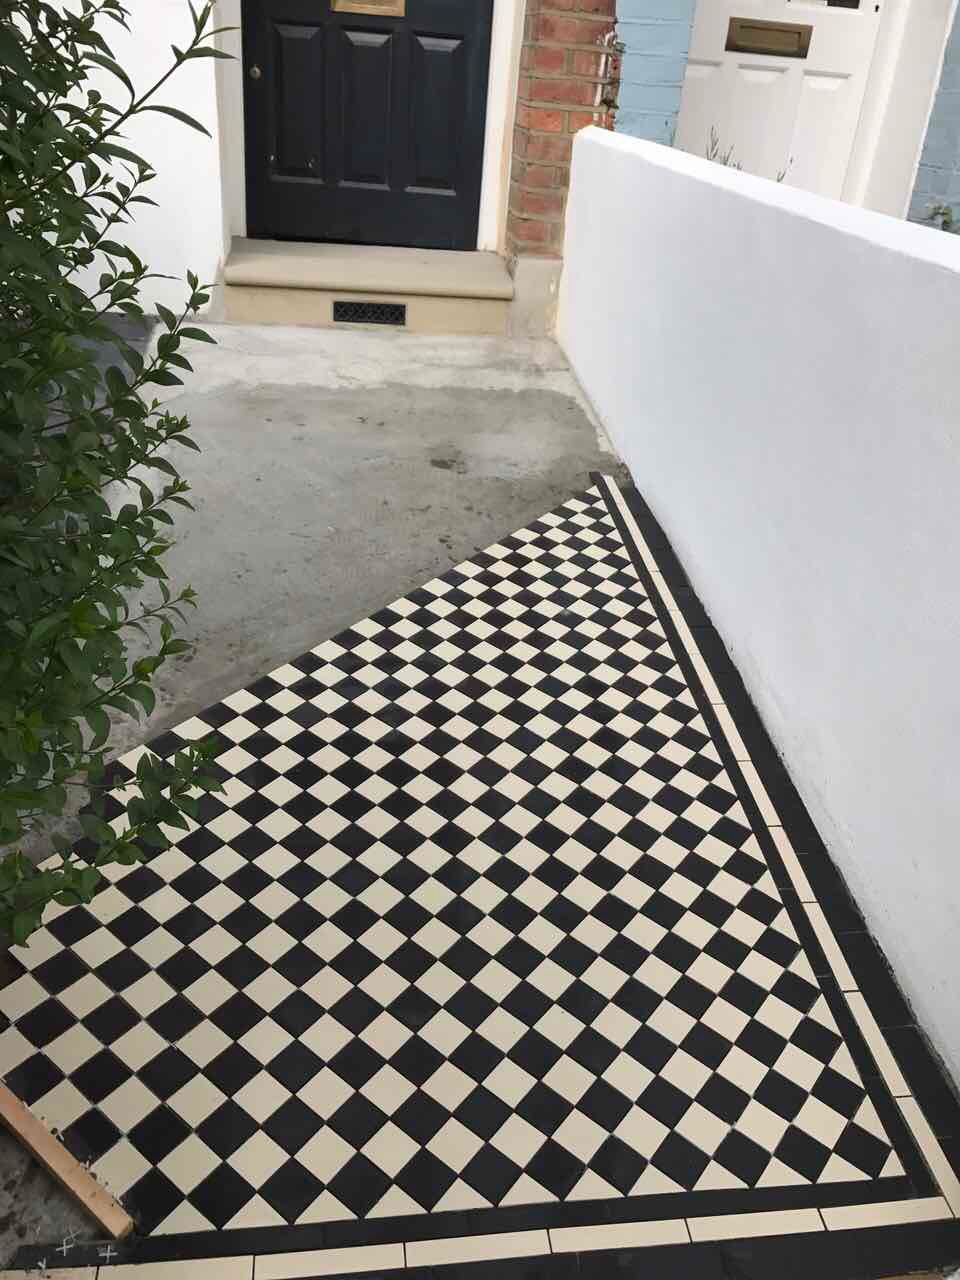 Tiled floor 3